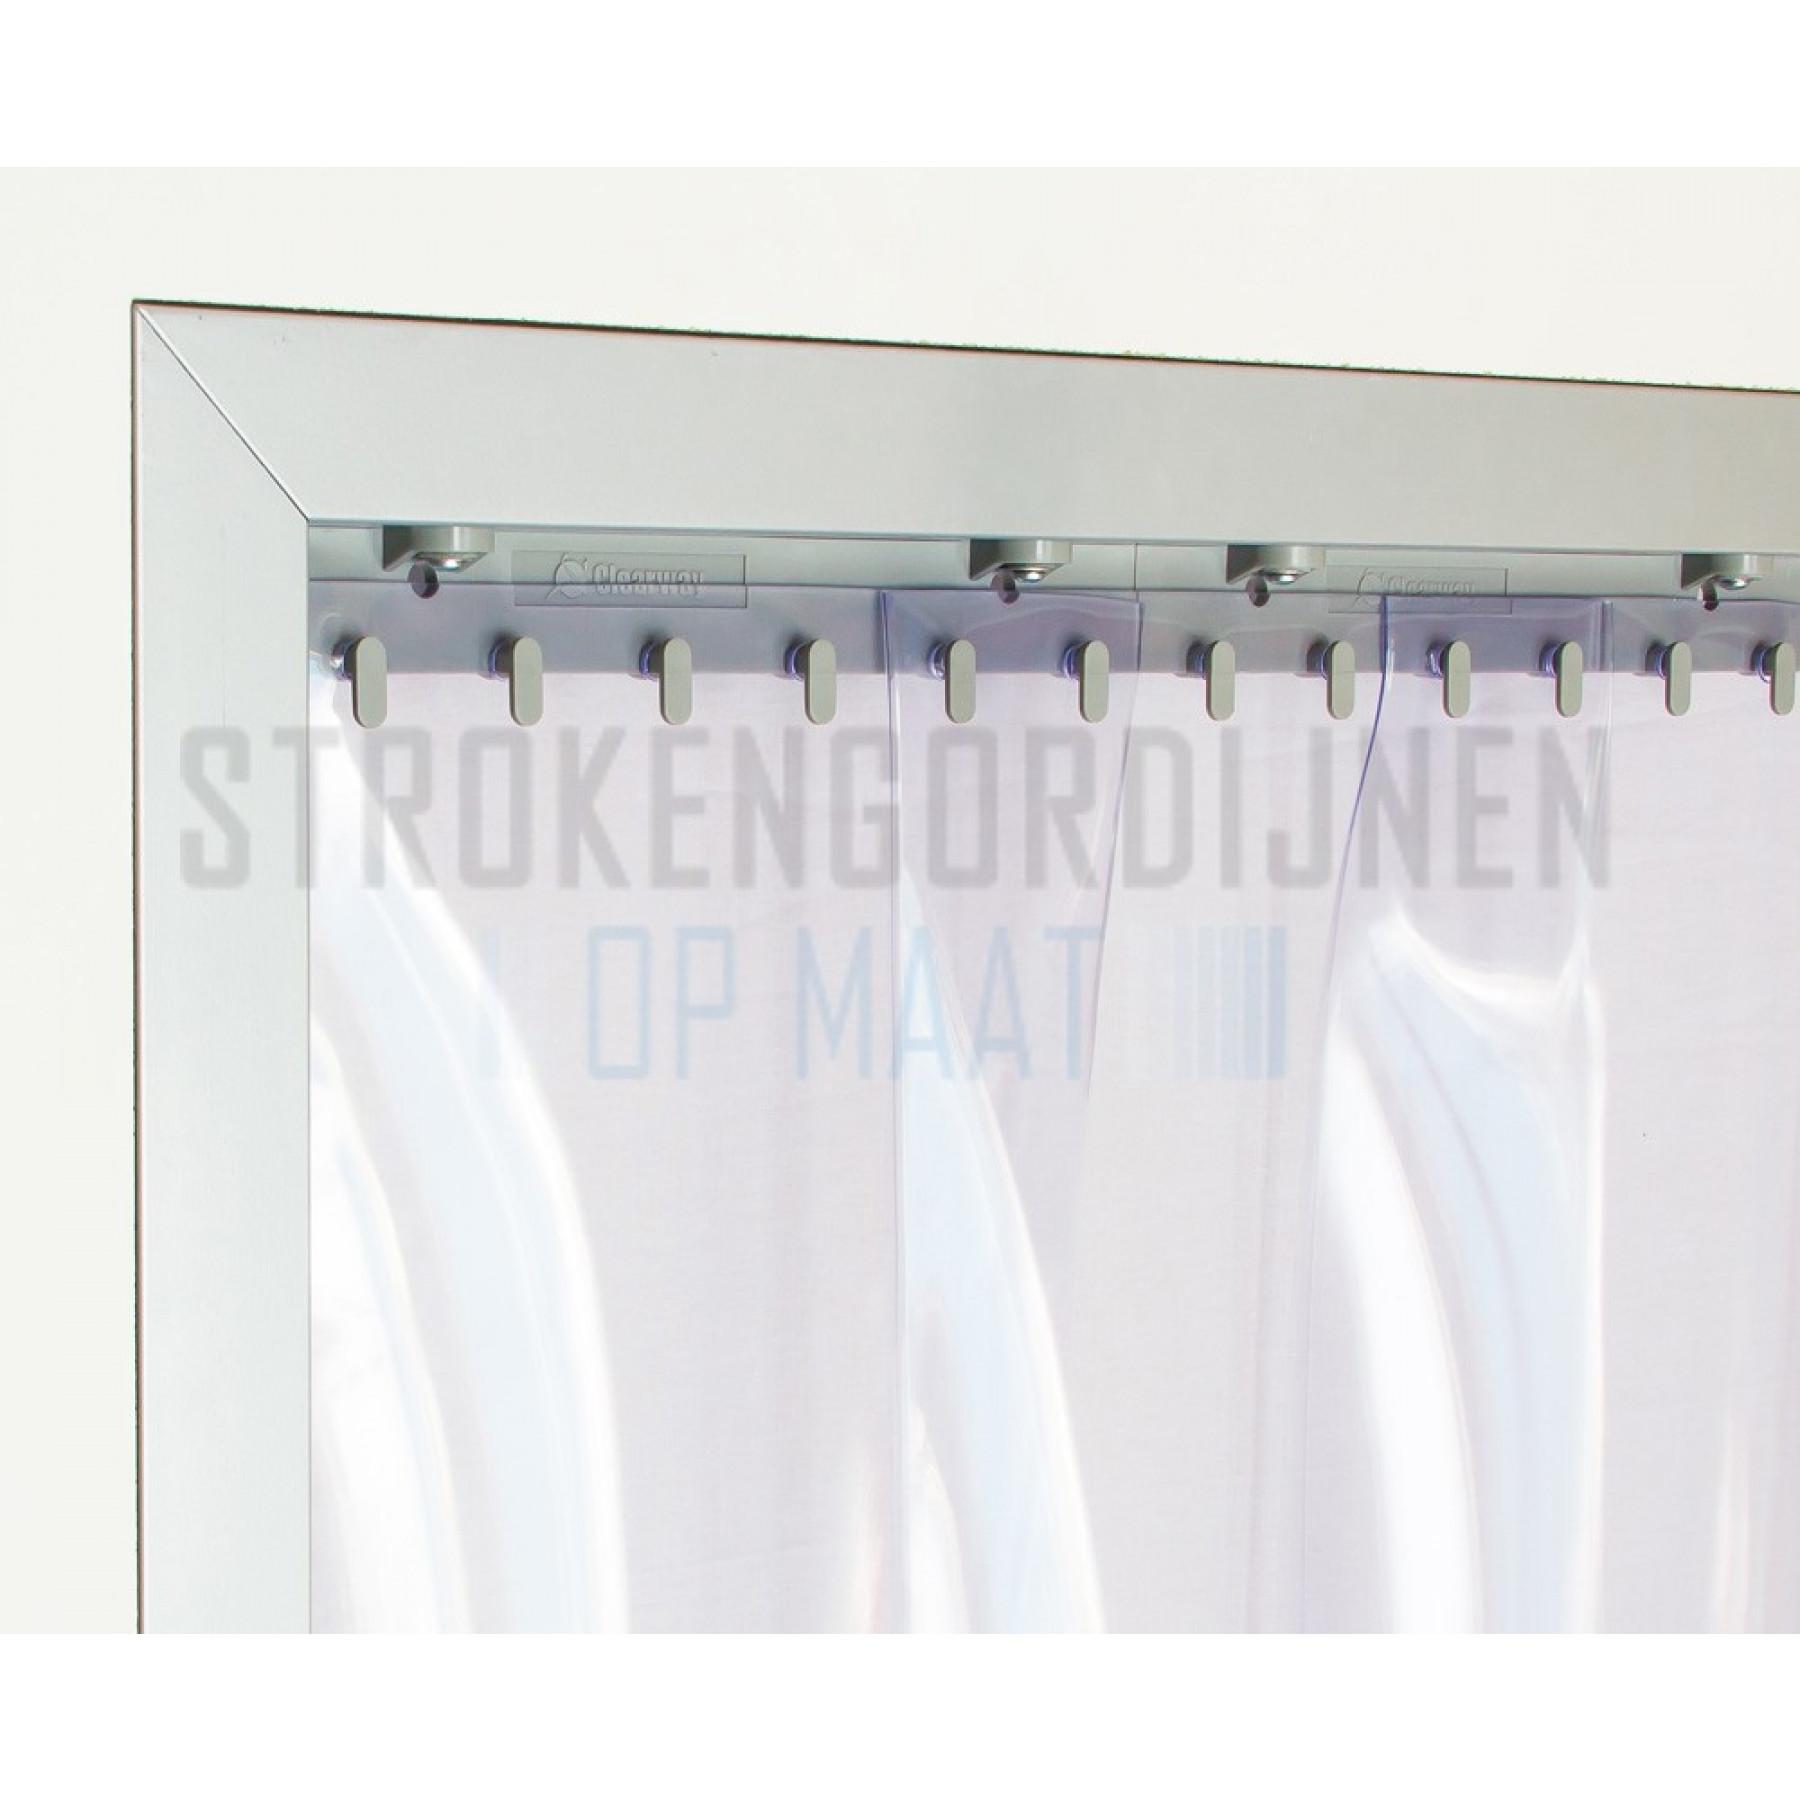 PVC Rolle,Food Safe, lebensmittelbereich, 200mm breit, 2mm dick. Länge: 50 Meter PVC.